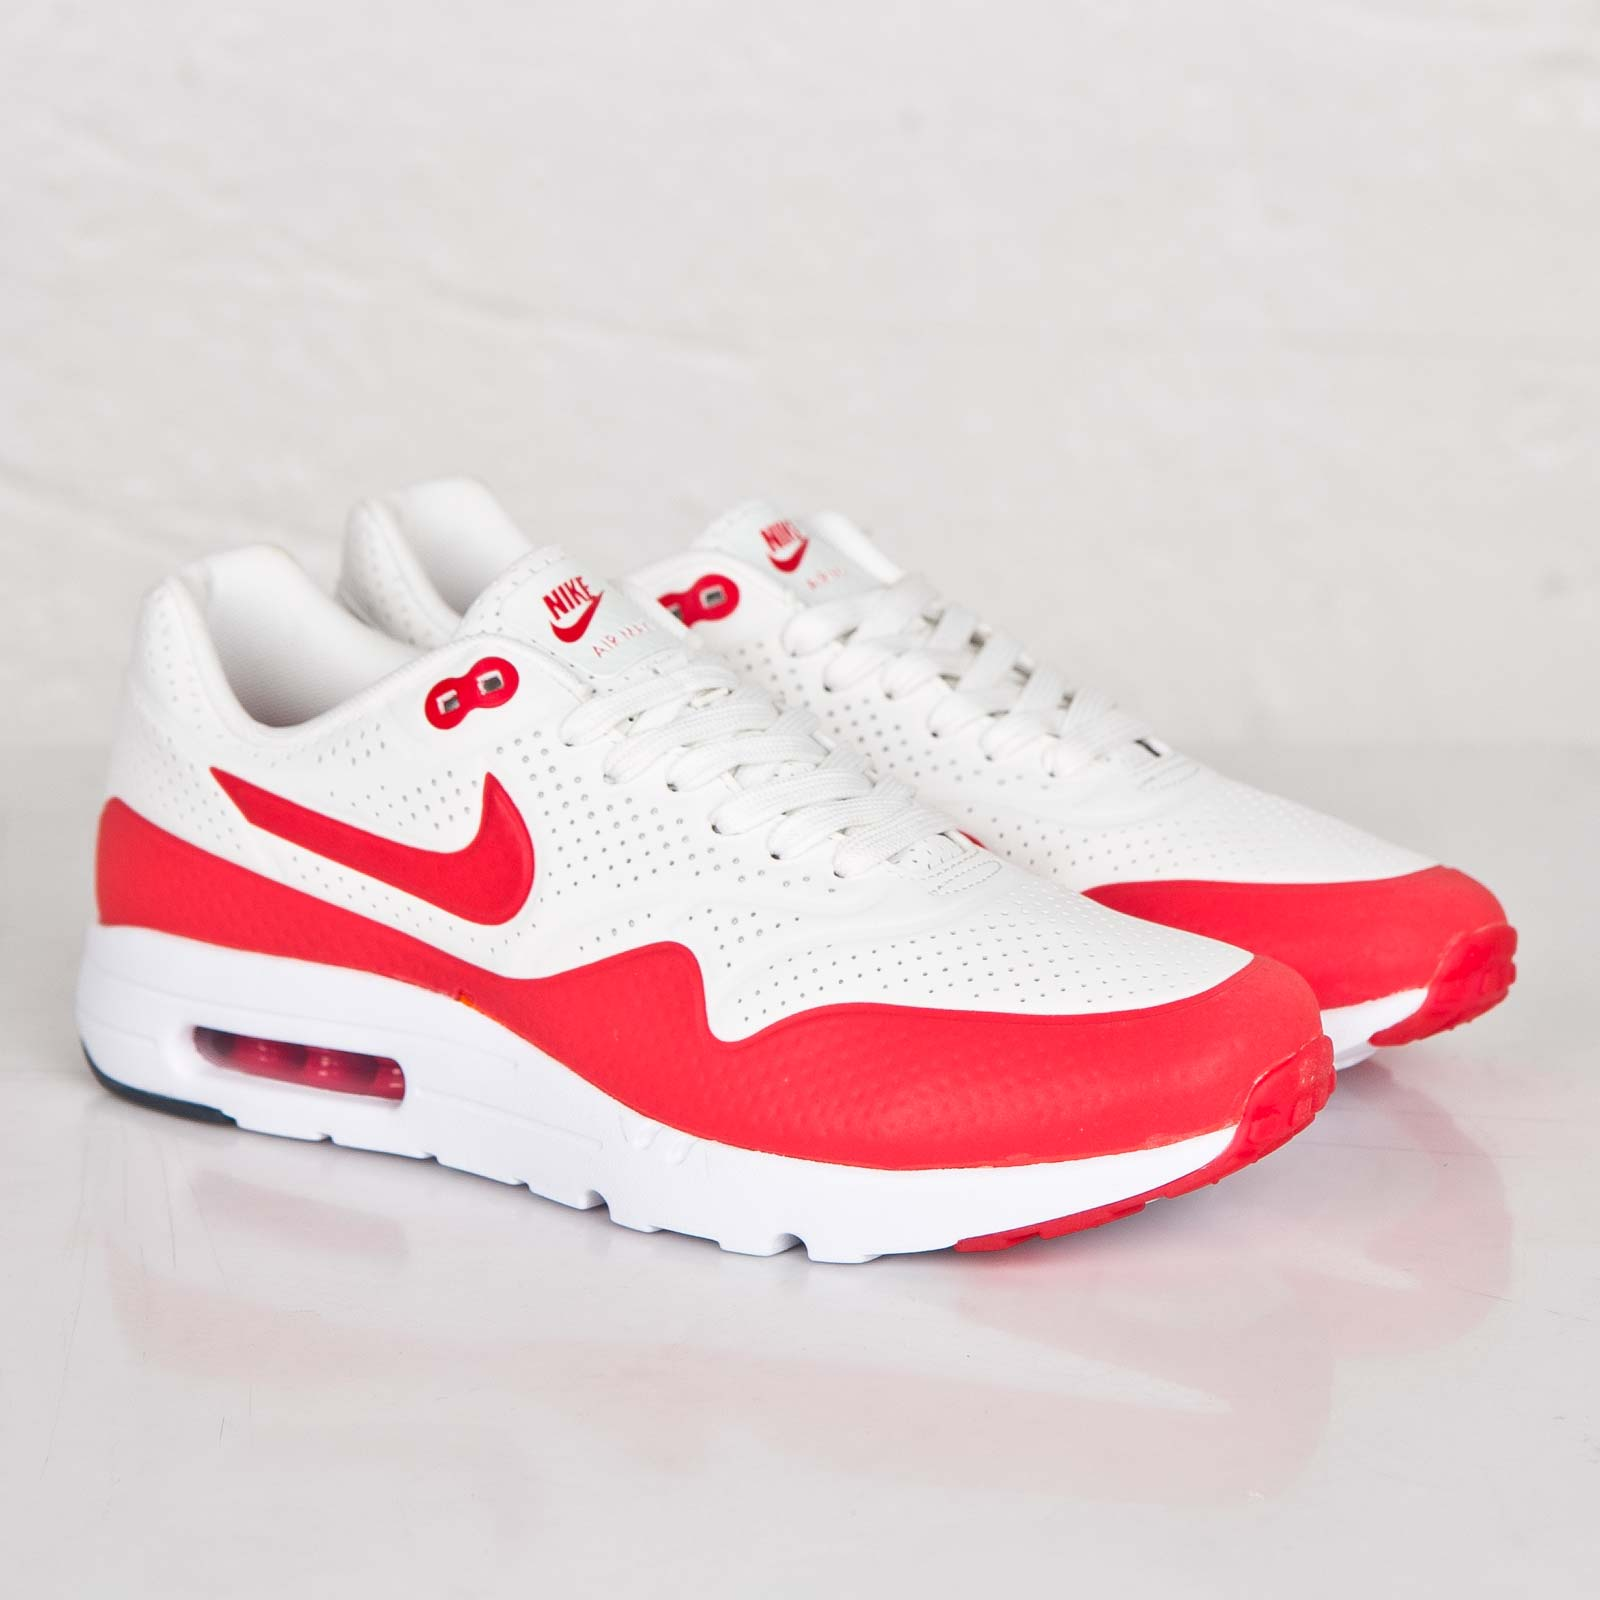 ca9c63e9f1bae9 Nike Air Max 1 Ultra Moire - 705297-106 - Sneakersnstuff